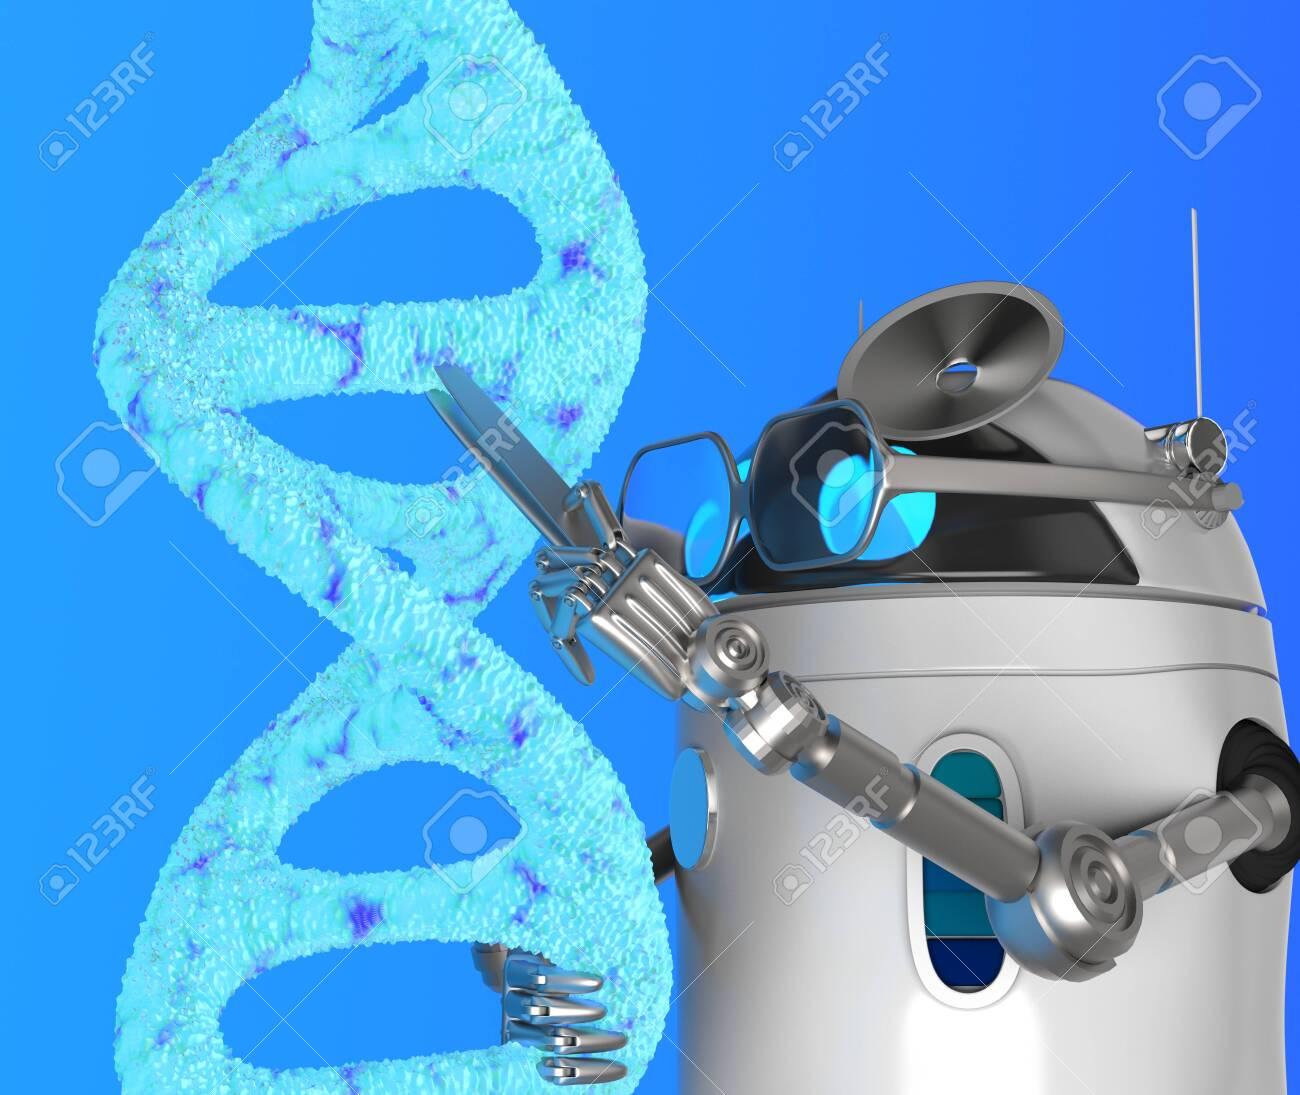 The robot fix Blue Dna molecule,text,3d render. - 131122246